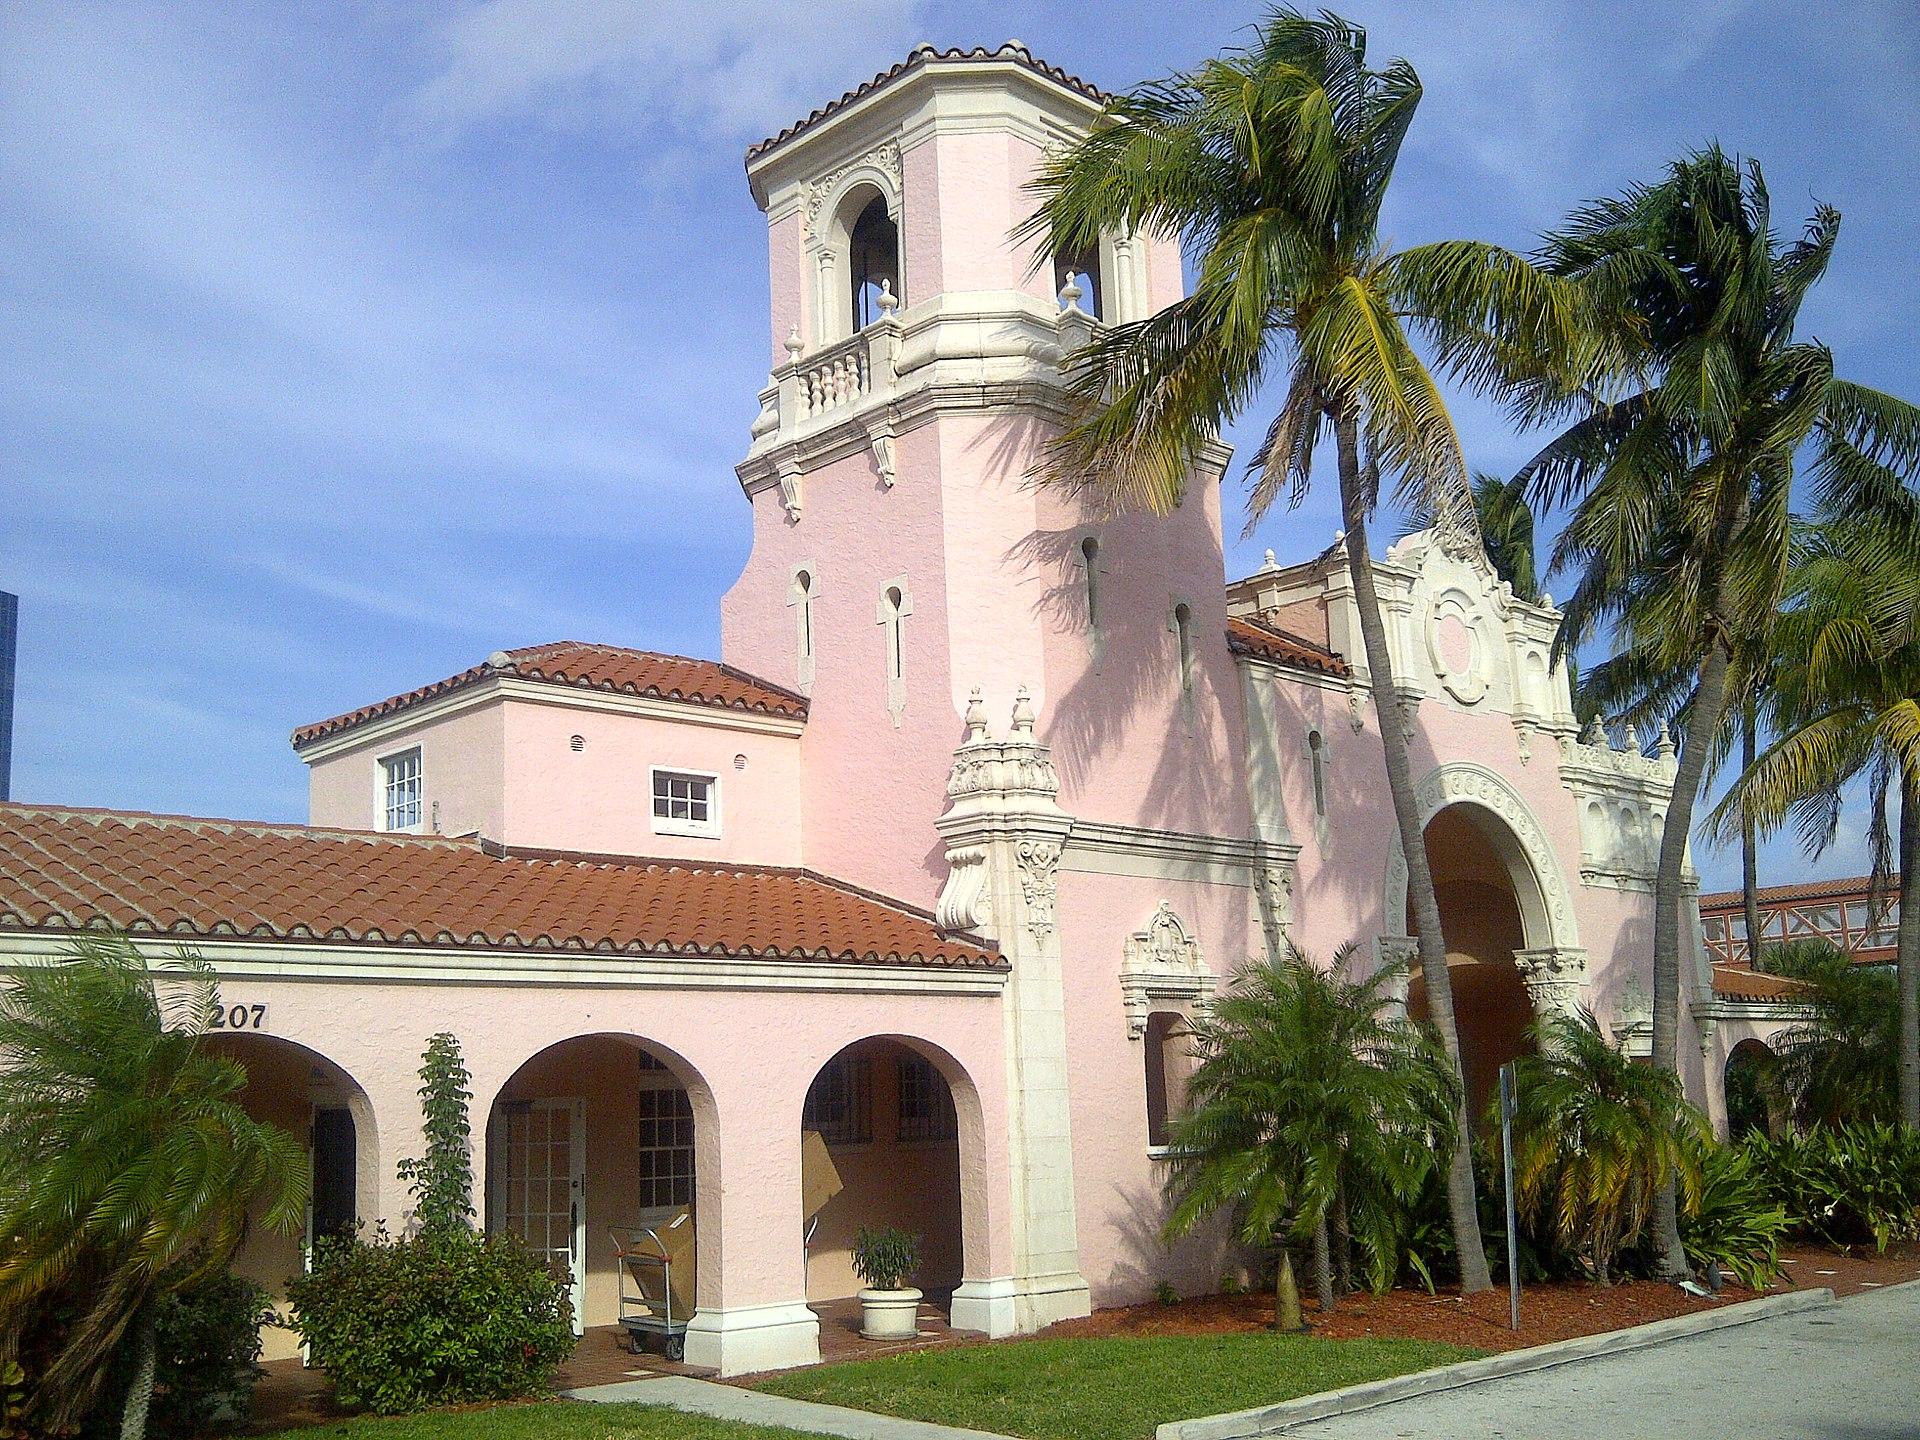 West Palm Beach City Data Forum